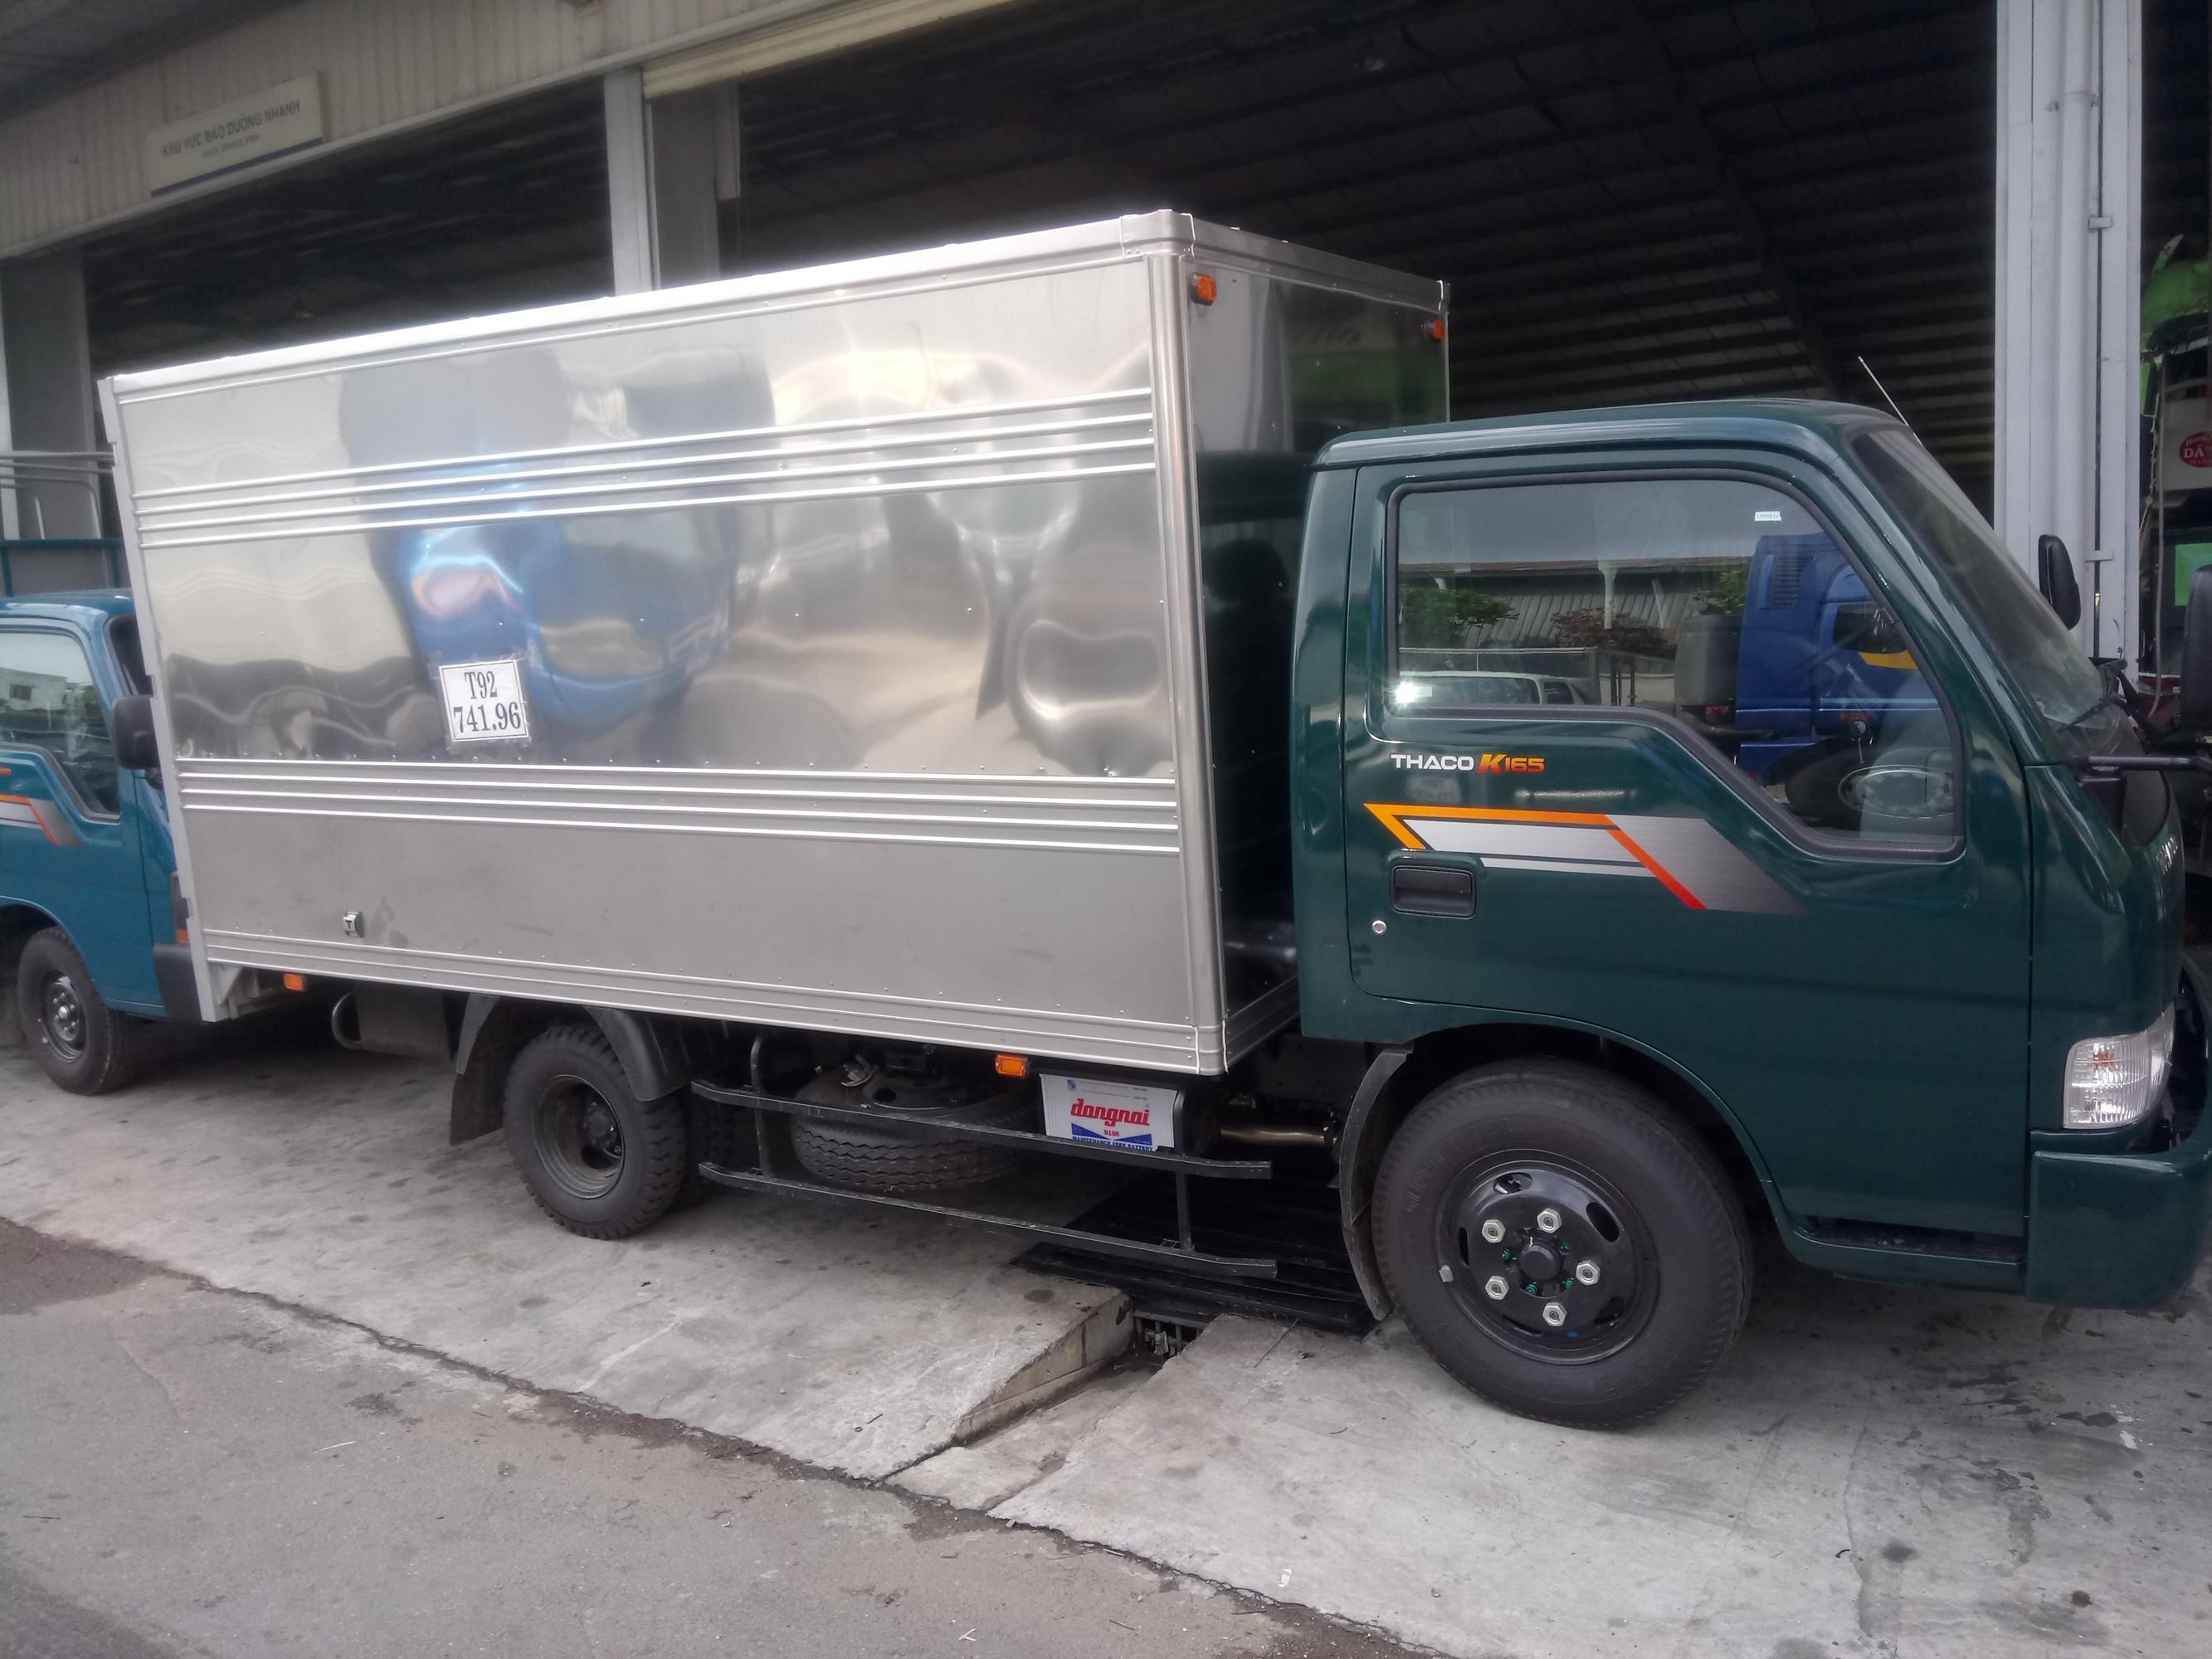 Xe tải kia 2400 KG, xe tải nhẹ Kia 2T4, xe tải Kia 2 tấn 4, xe tải Kia , Xe tải K165 2T4 Ảnh số 39631909